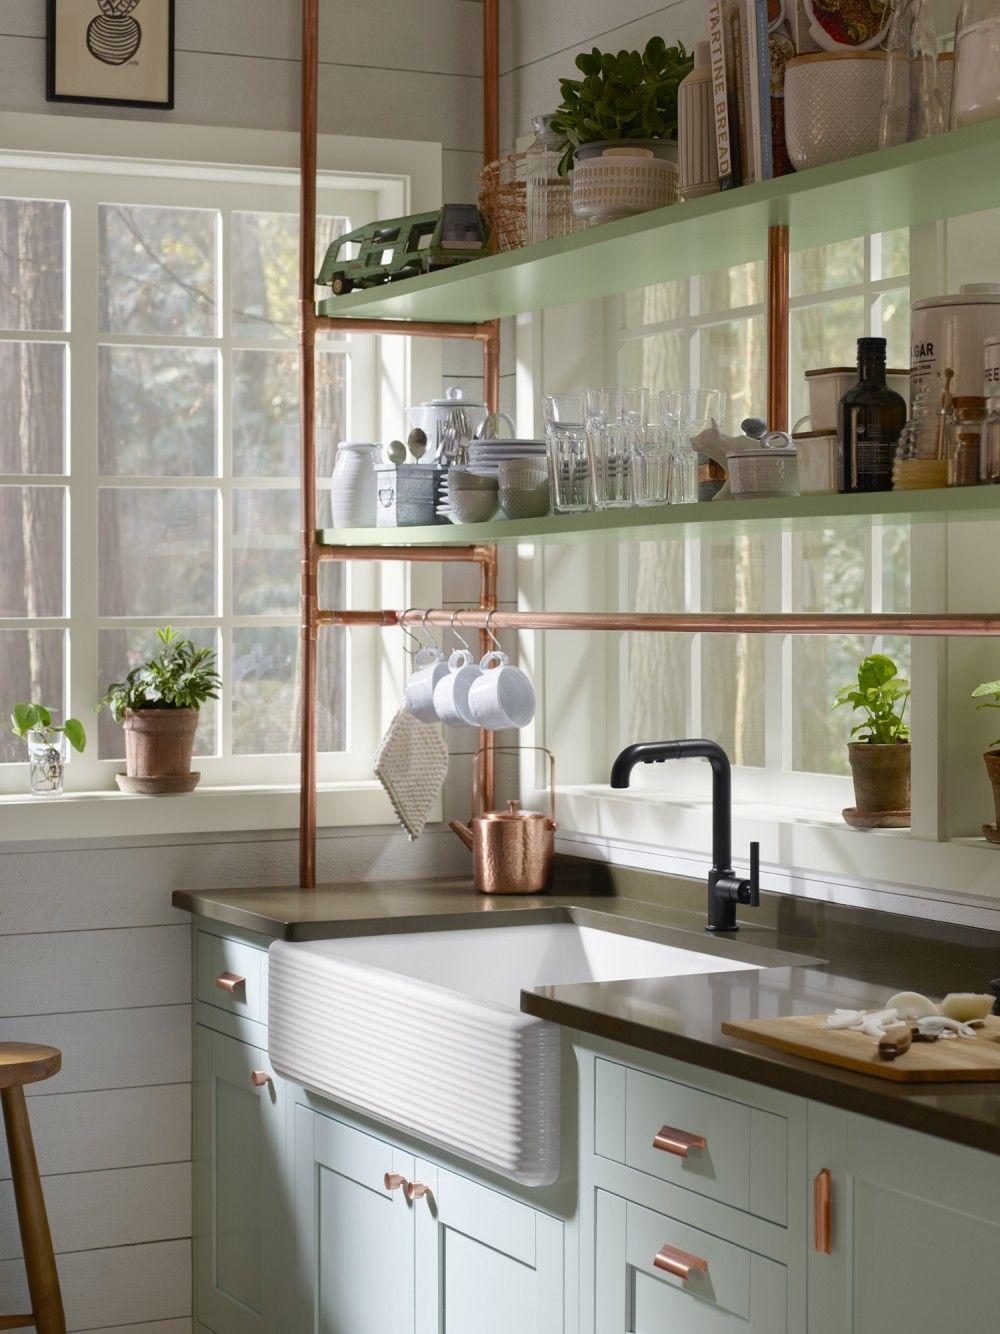 copper-pipes 80+ Unusual Kitchen Design Ideas for Small Spaces in 2021